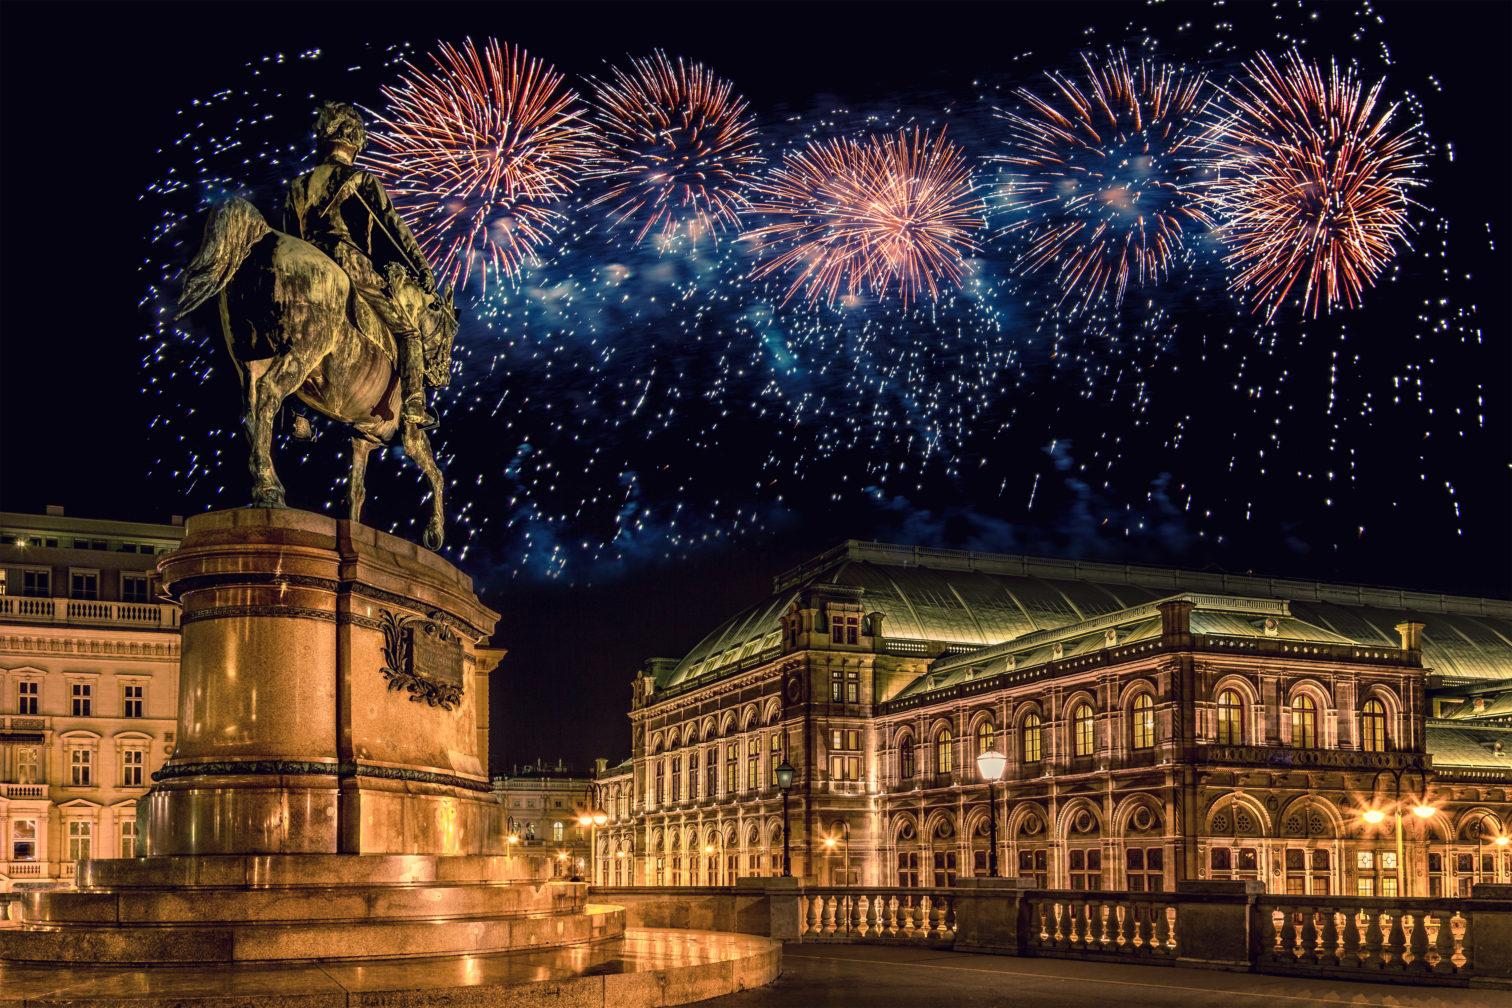 Fireworks on New Year's Eve in Vienna, Austria.